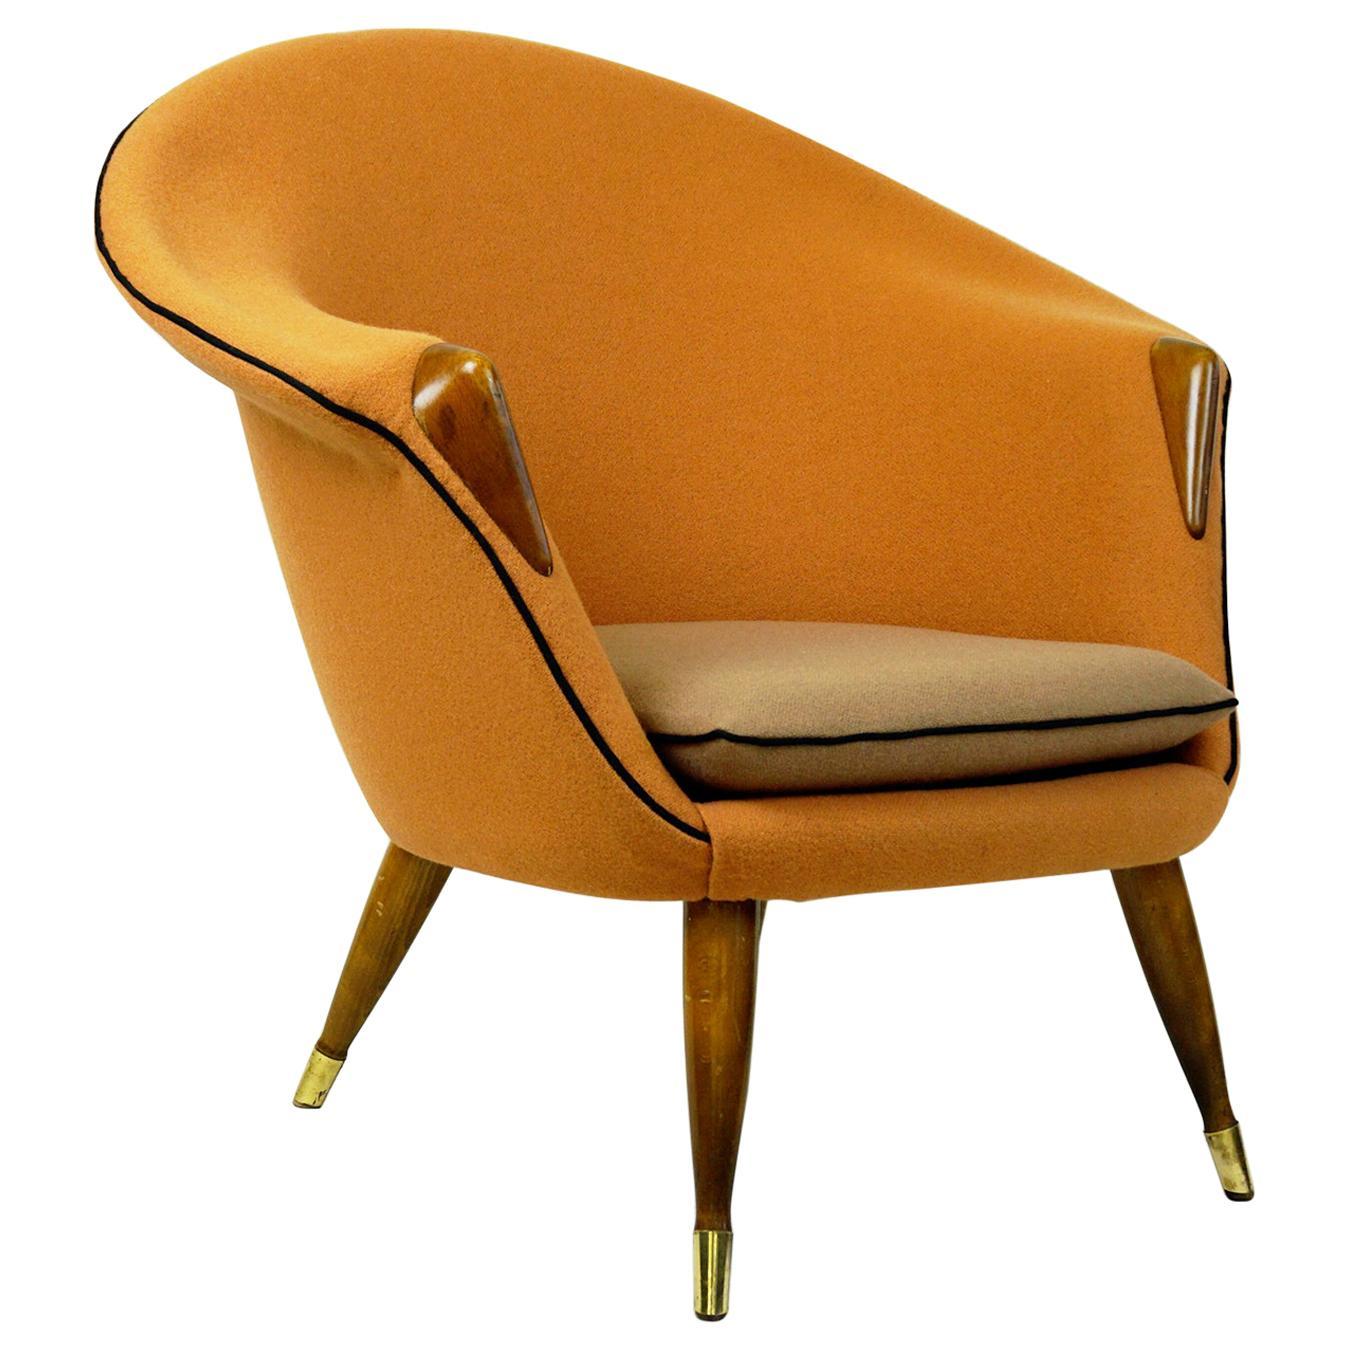 Scandinavian Elm Lounge Chair with New Soft Orange Kvadrat Wool Fabric